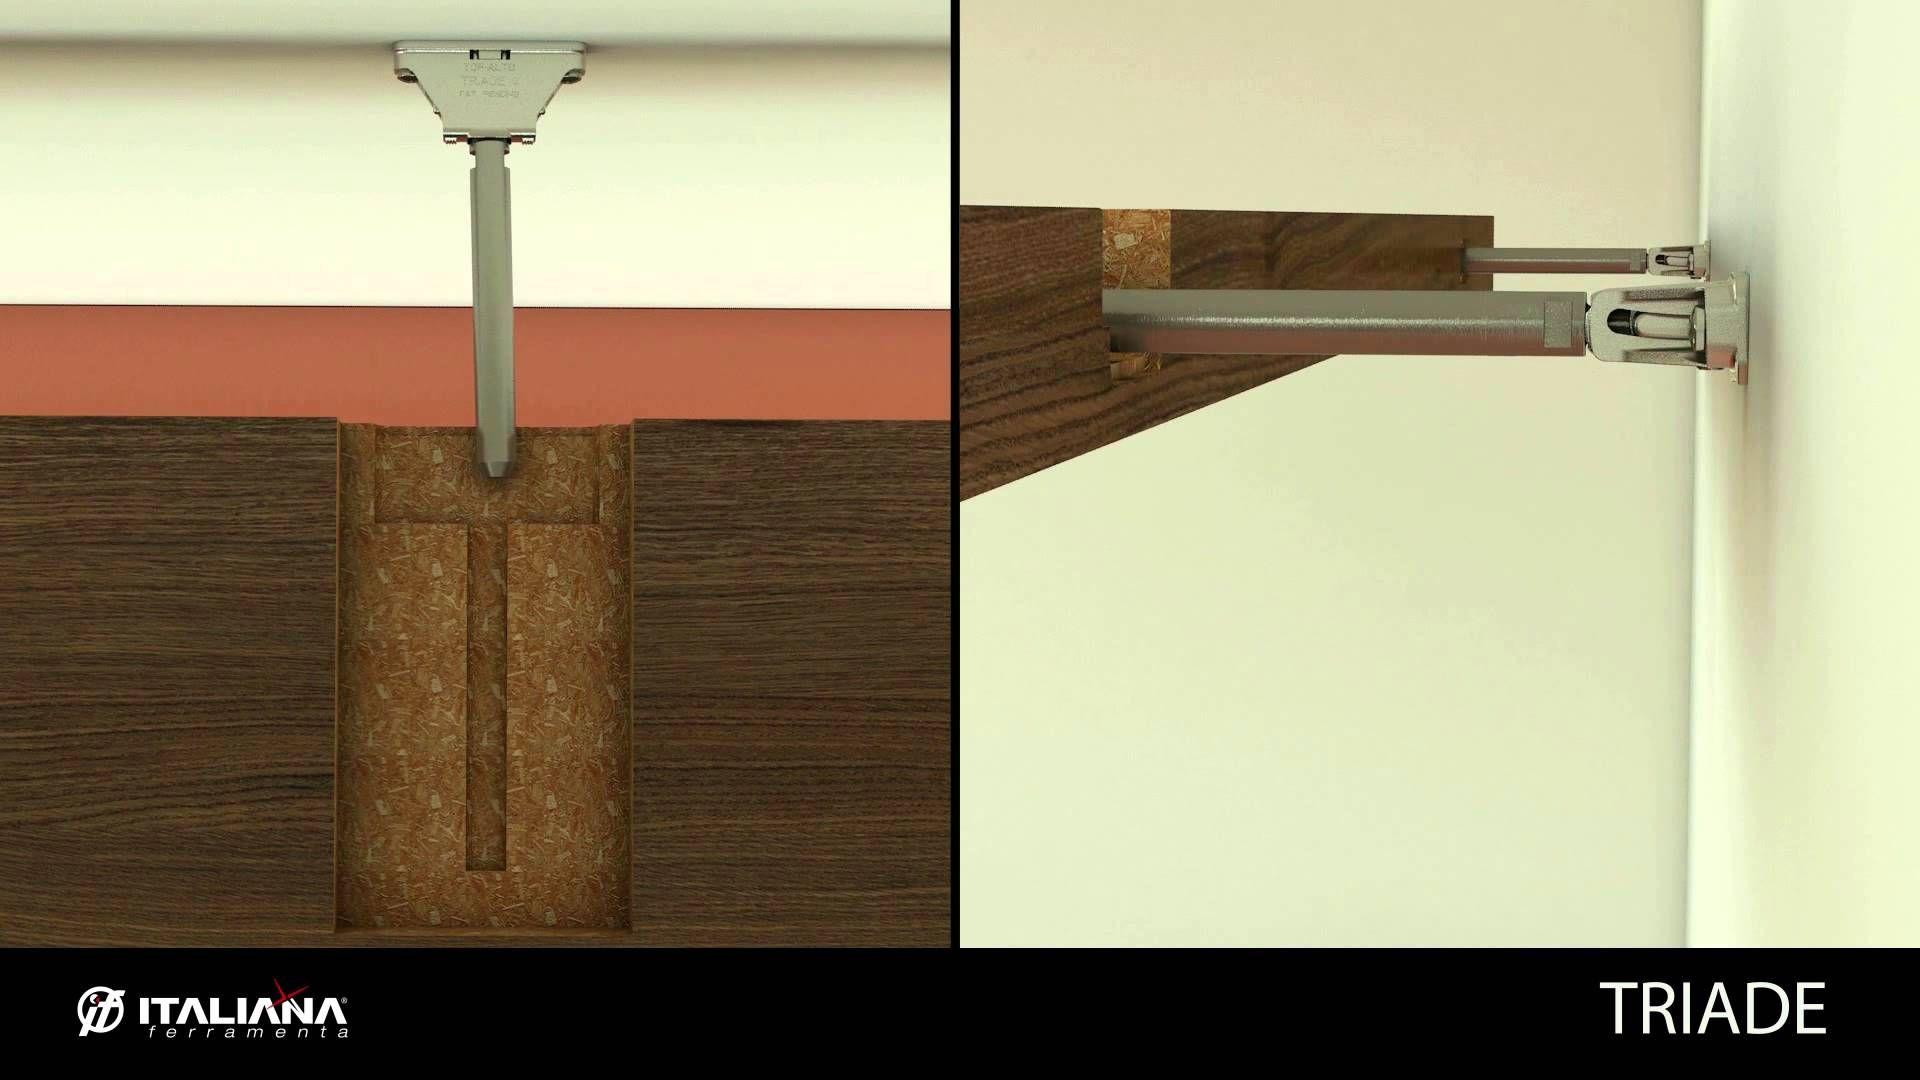 triade concealed shelf support shelving system italiana brackets hidden floating ferramenta interior design ideas battery powered night light rustic kitchen shelves triangle